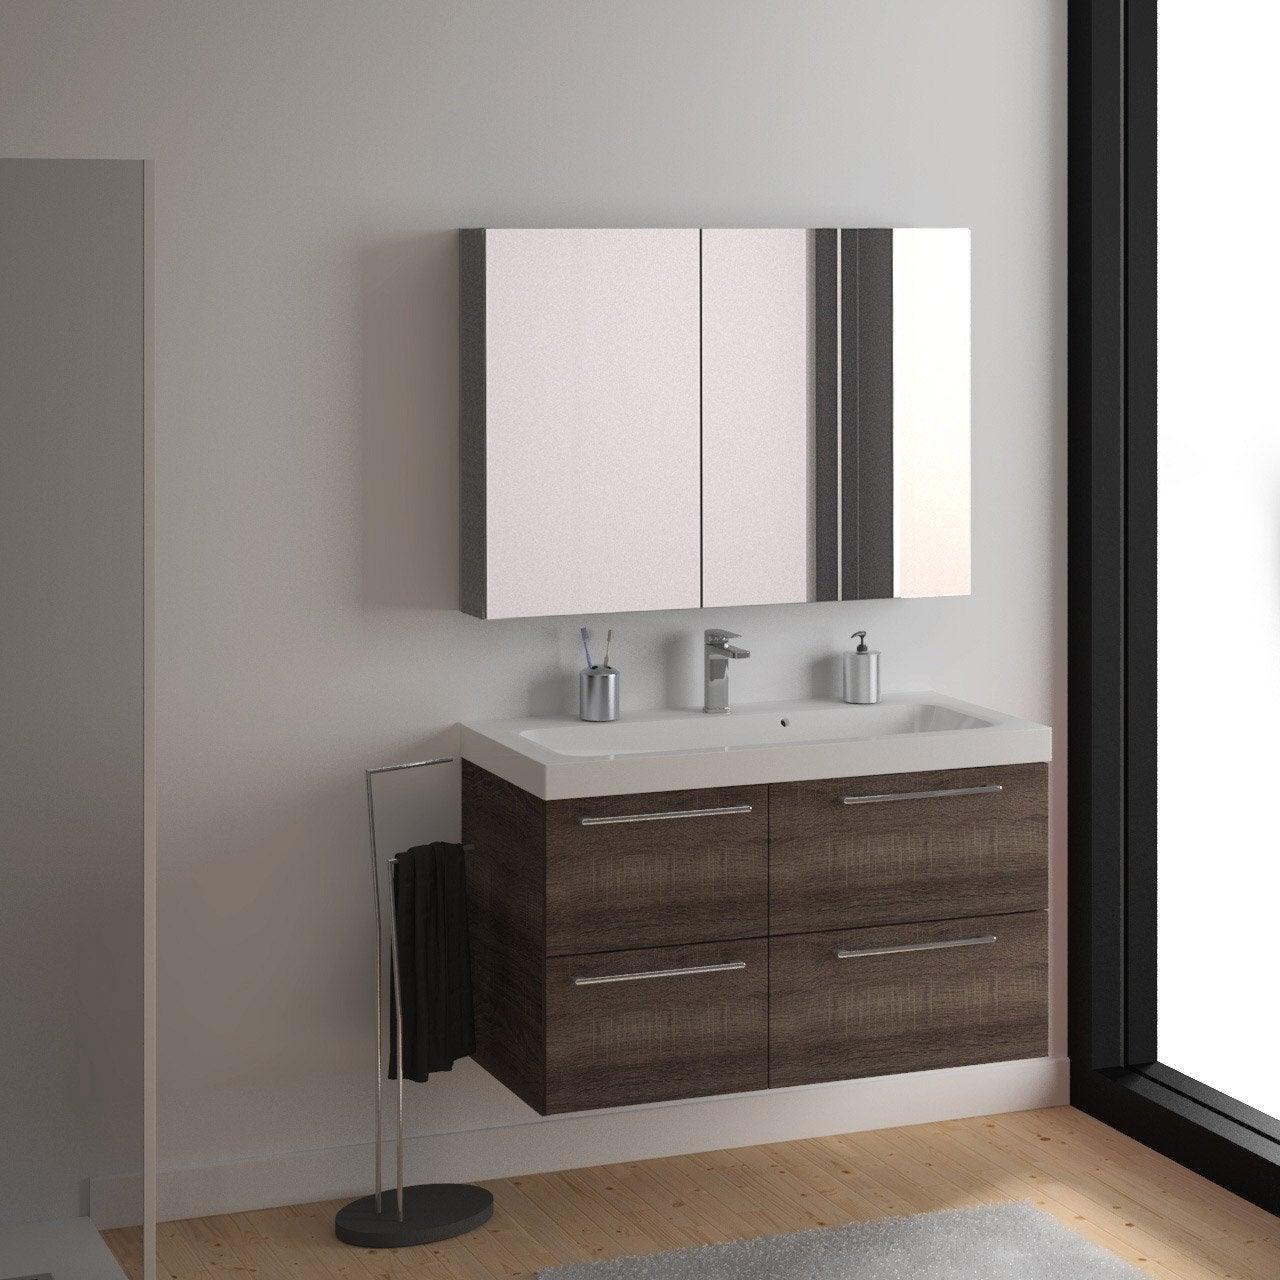 Meuble vasque x x cm imitation ch ne naturel sensea remix leroy merlin for Salle de bain tadelakt gris